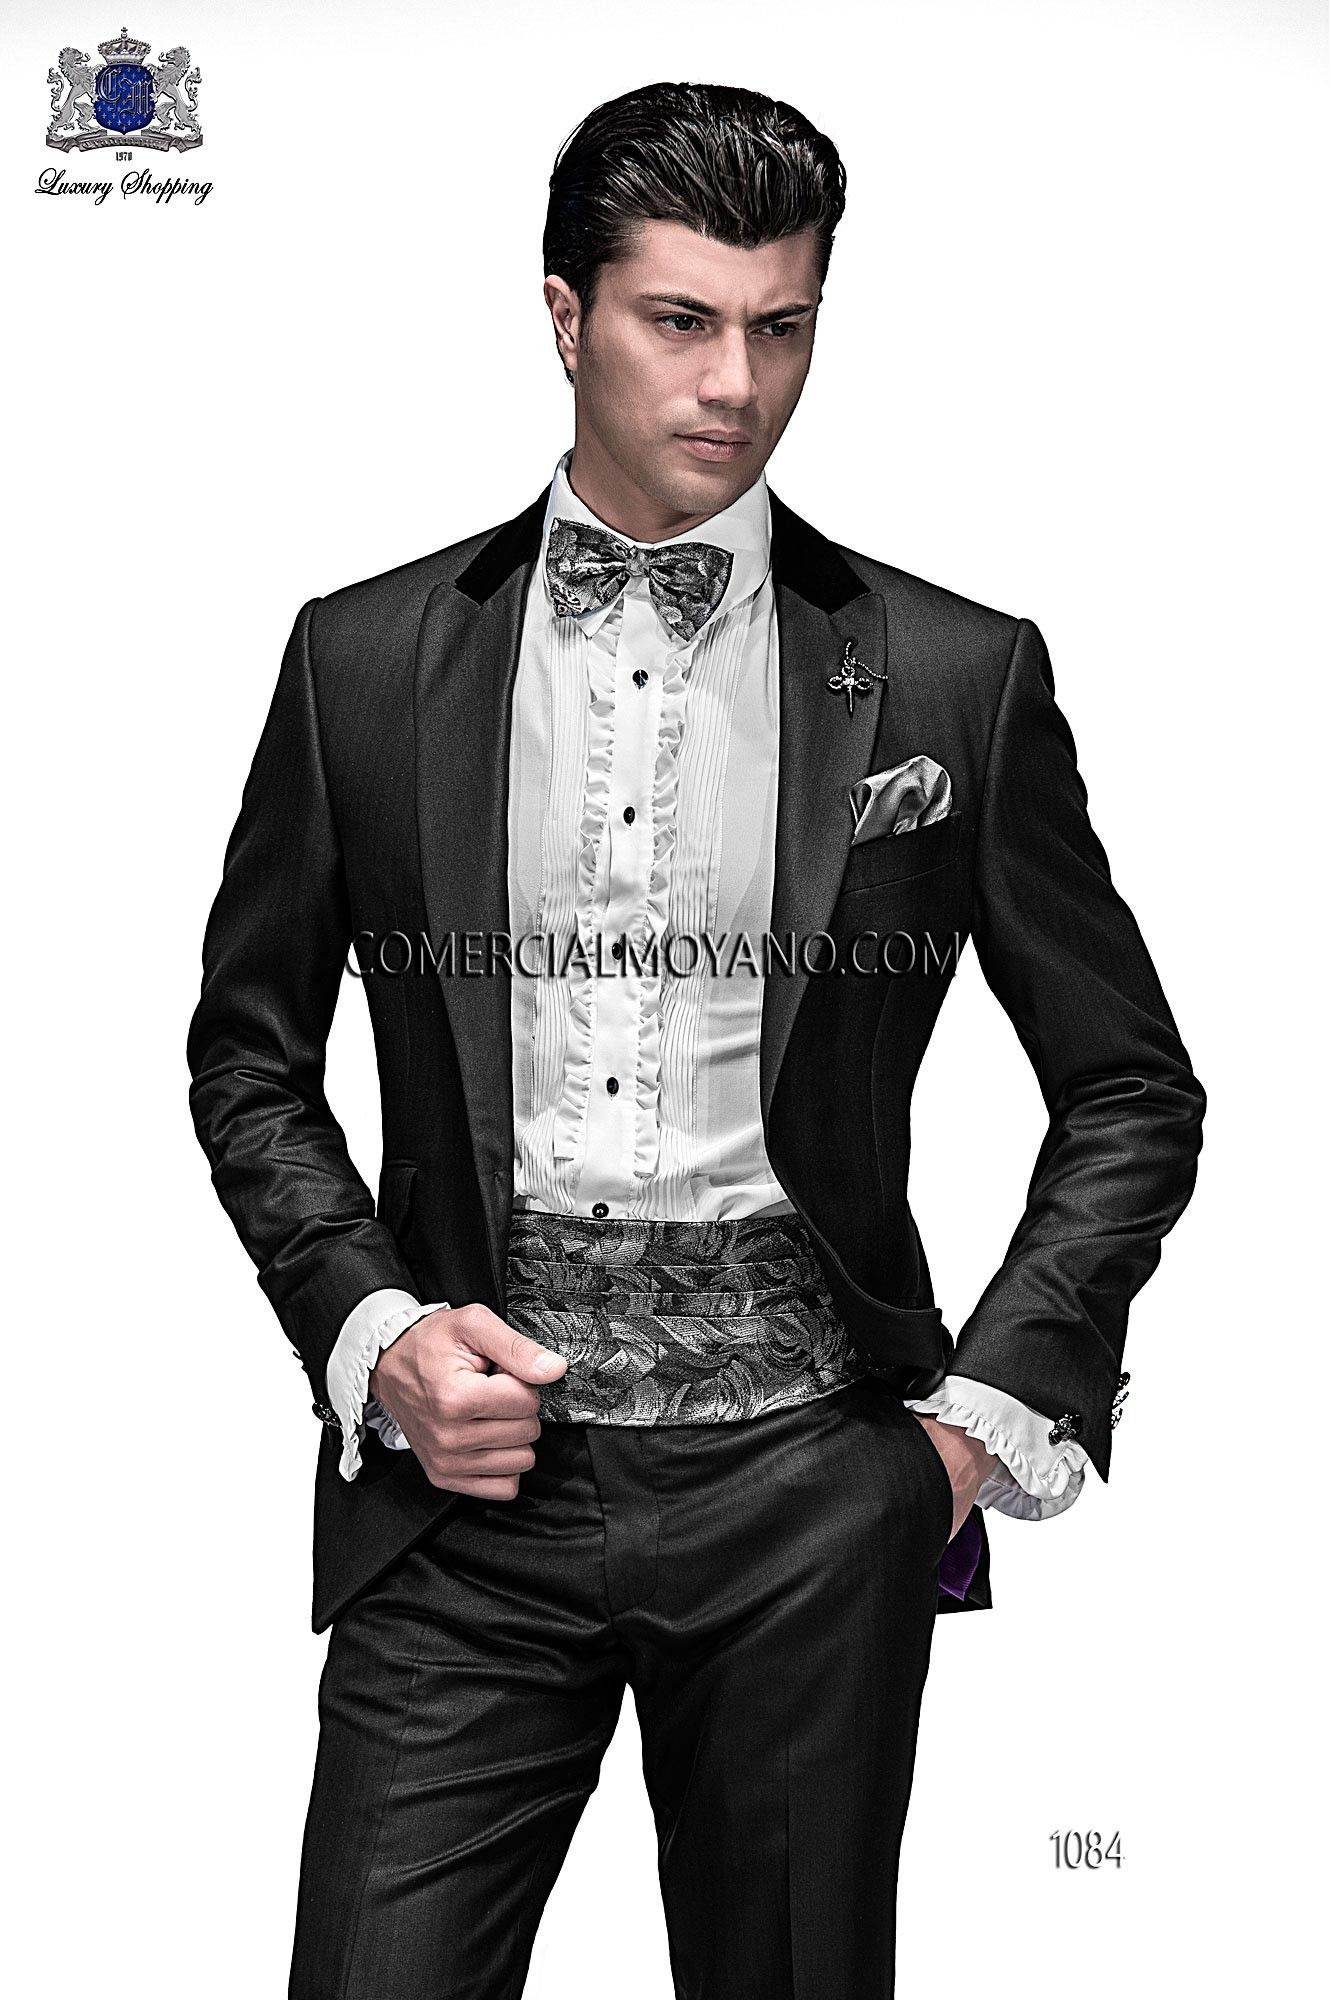 Italian bespoke black fashion suit, in new performance fabric, style 1084 Ottavio Nuccio Gala, 2015 Emotion collection.